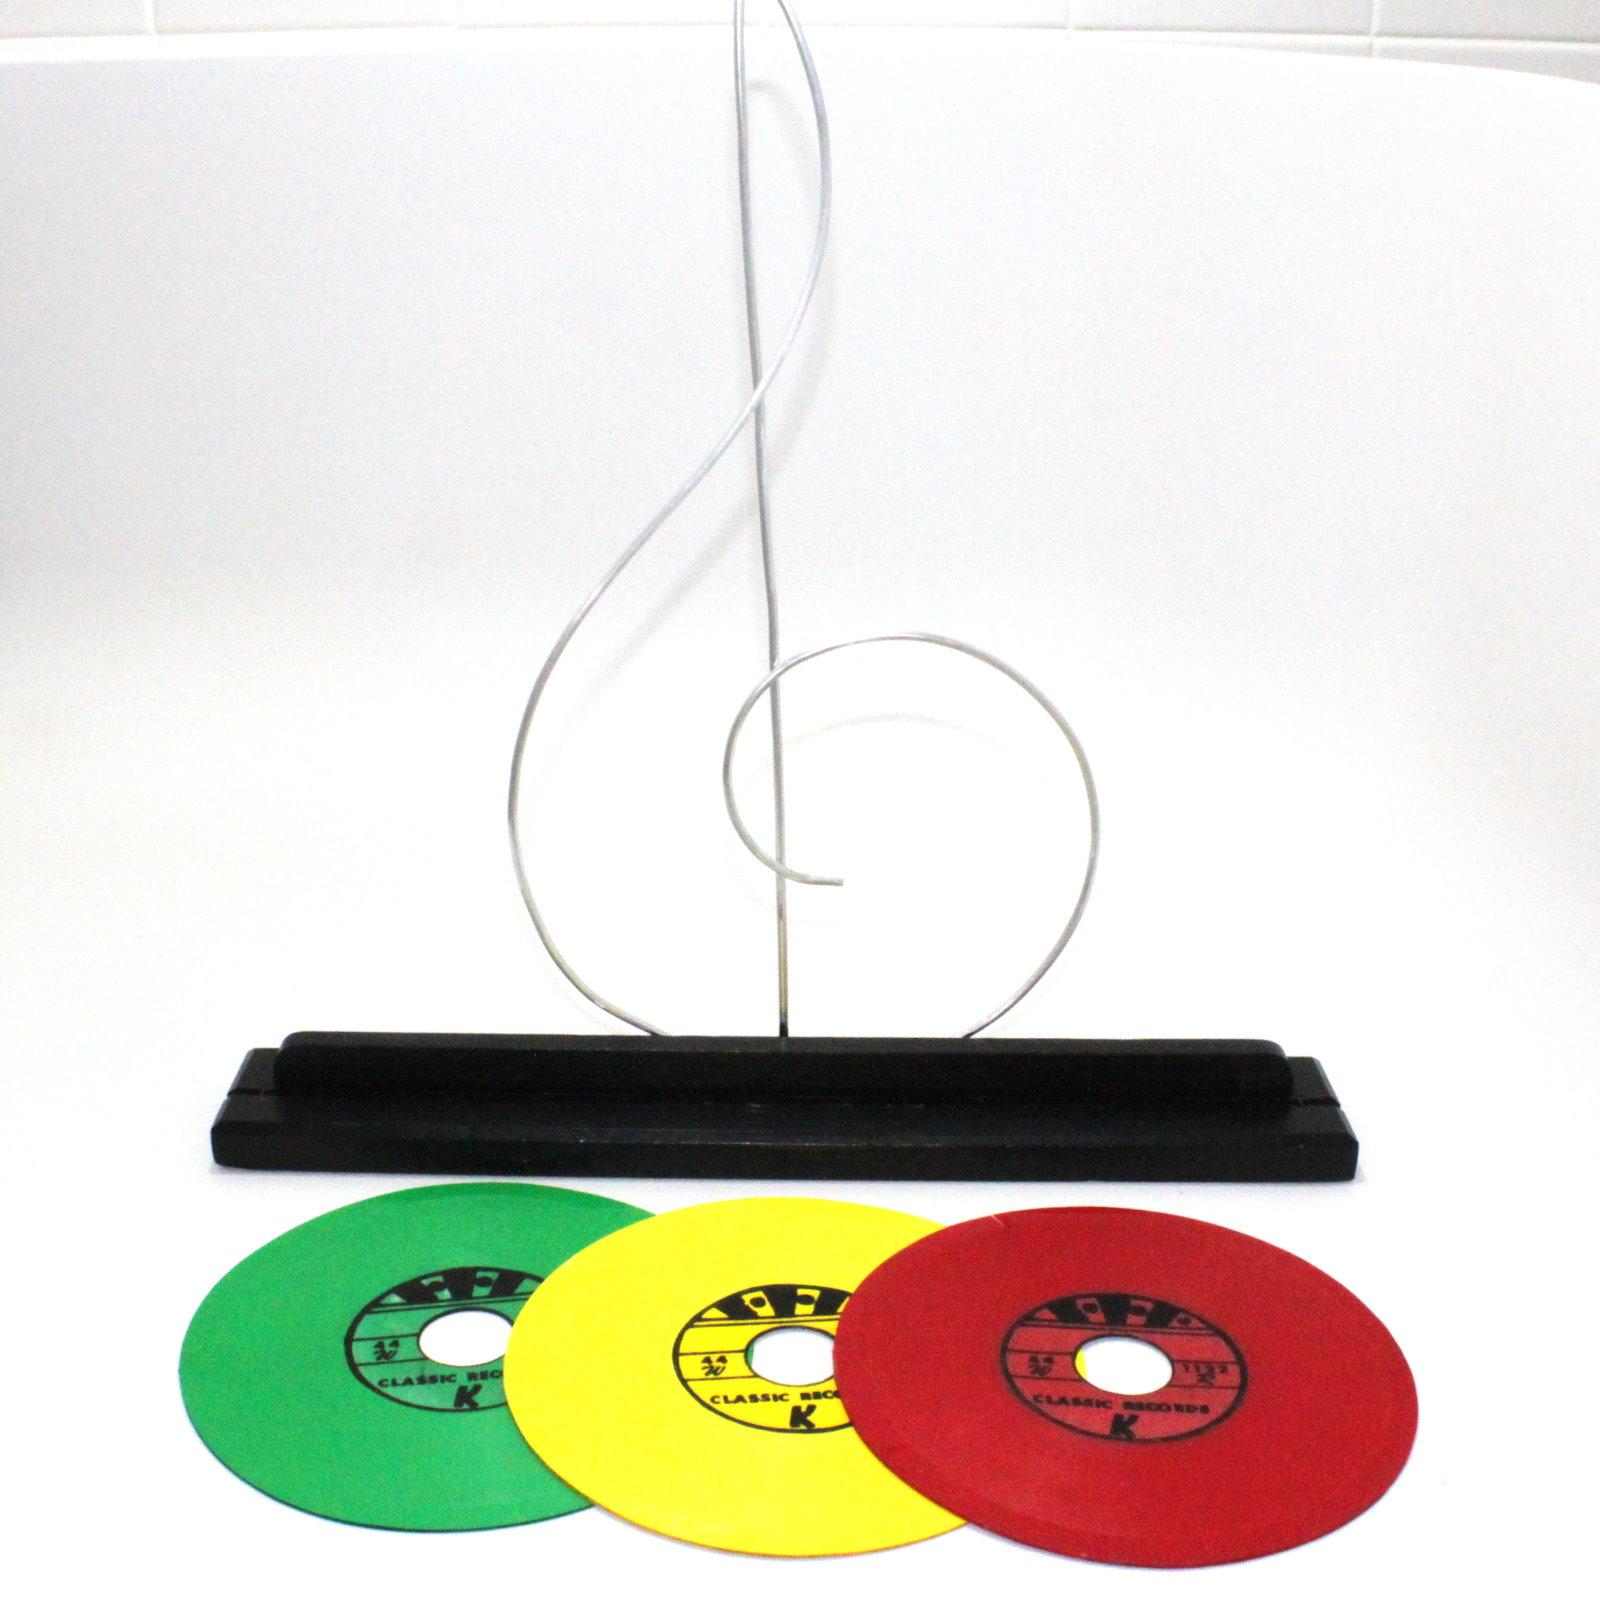 Classic Record Trick by Bob Kline